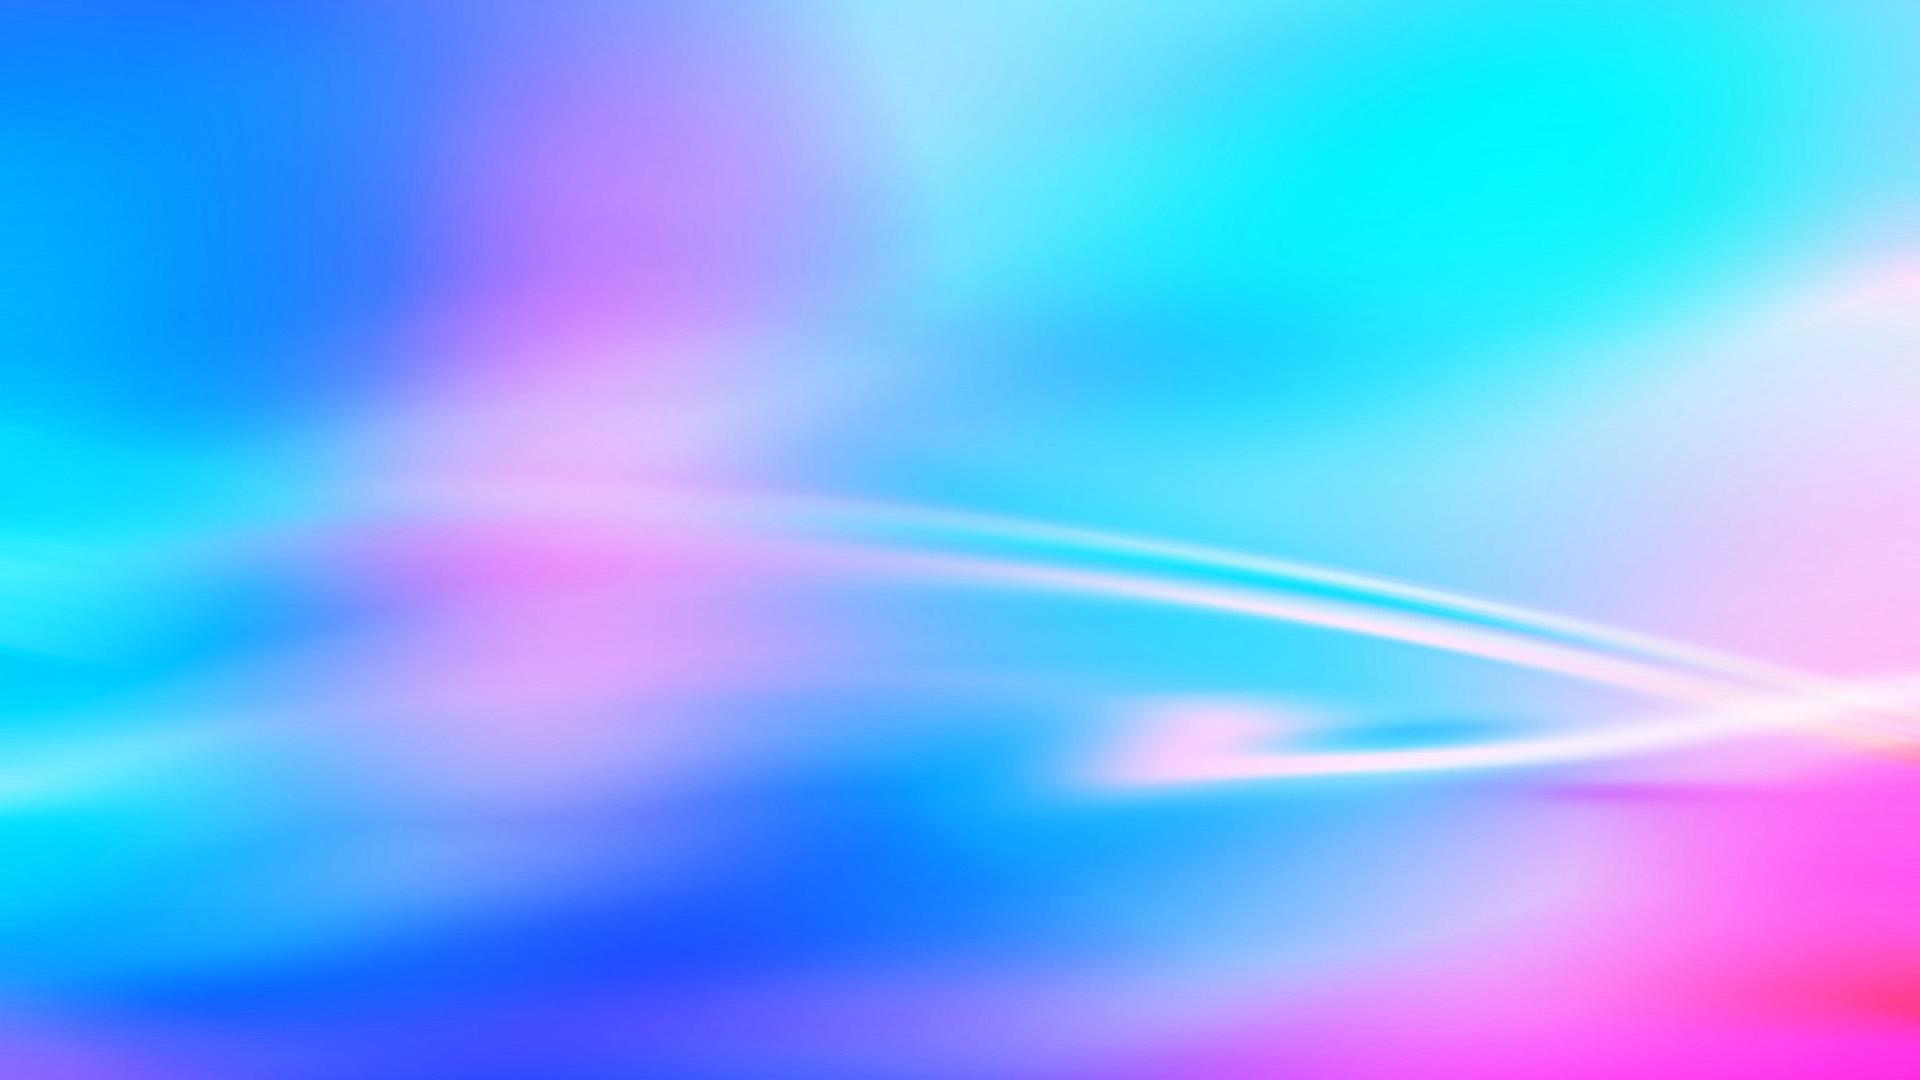 Light Blue and Pink Wallpaper - WallpaperSafari